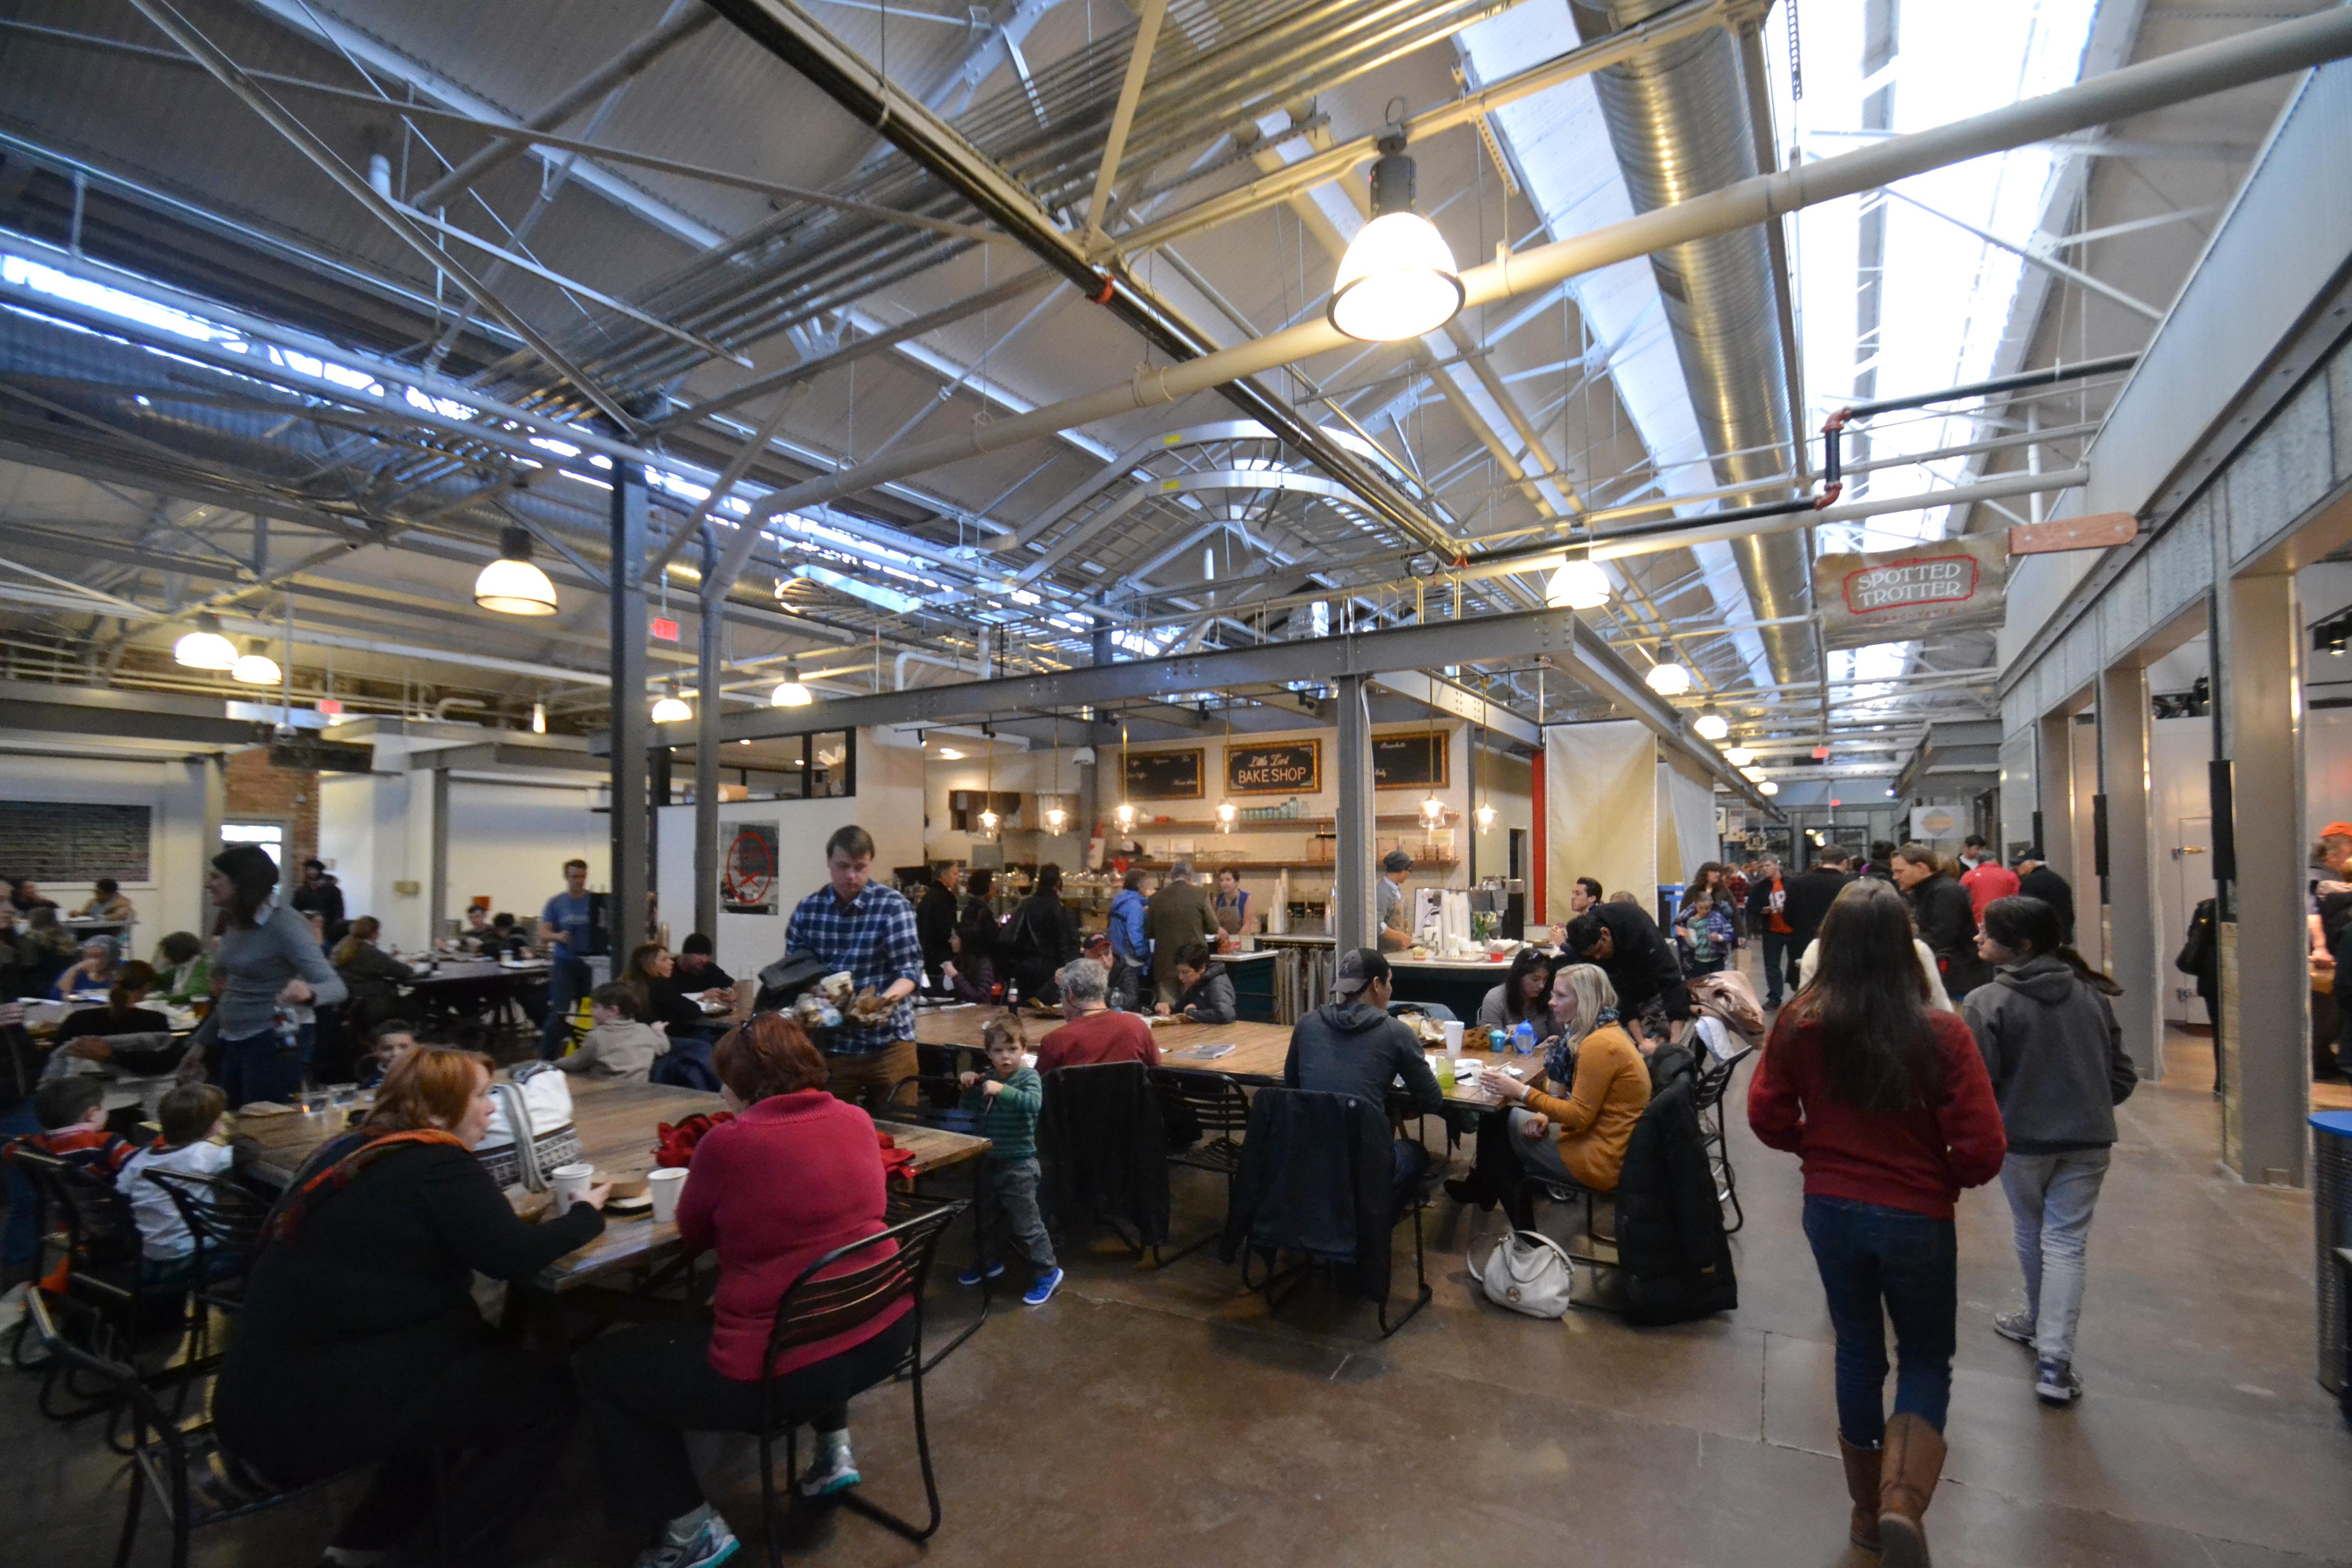 Krog Street Market Atlanta Ga Finding Family